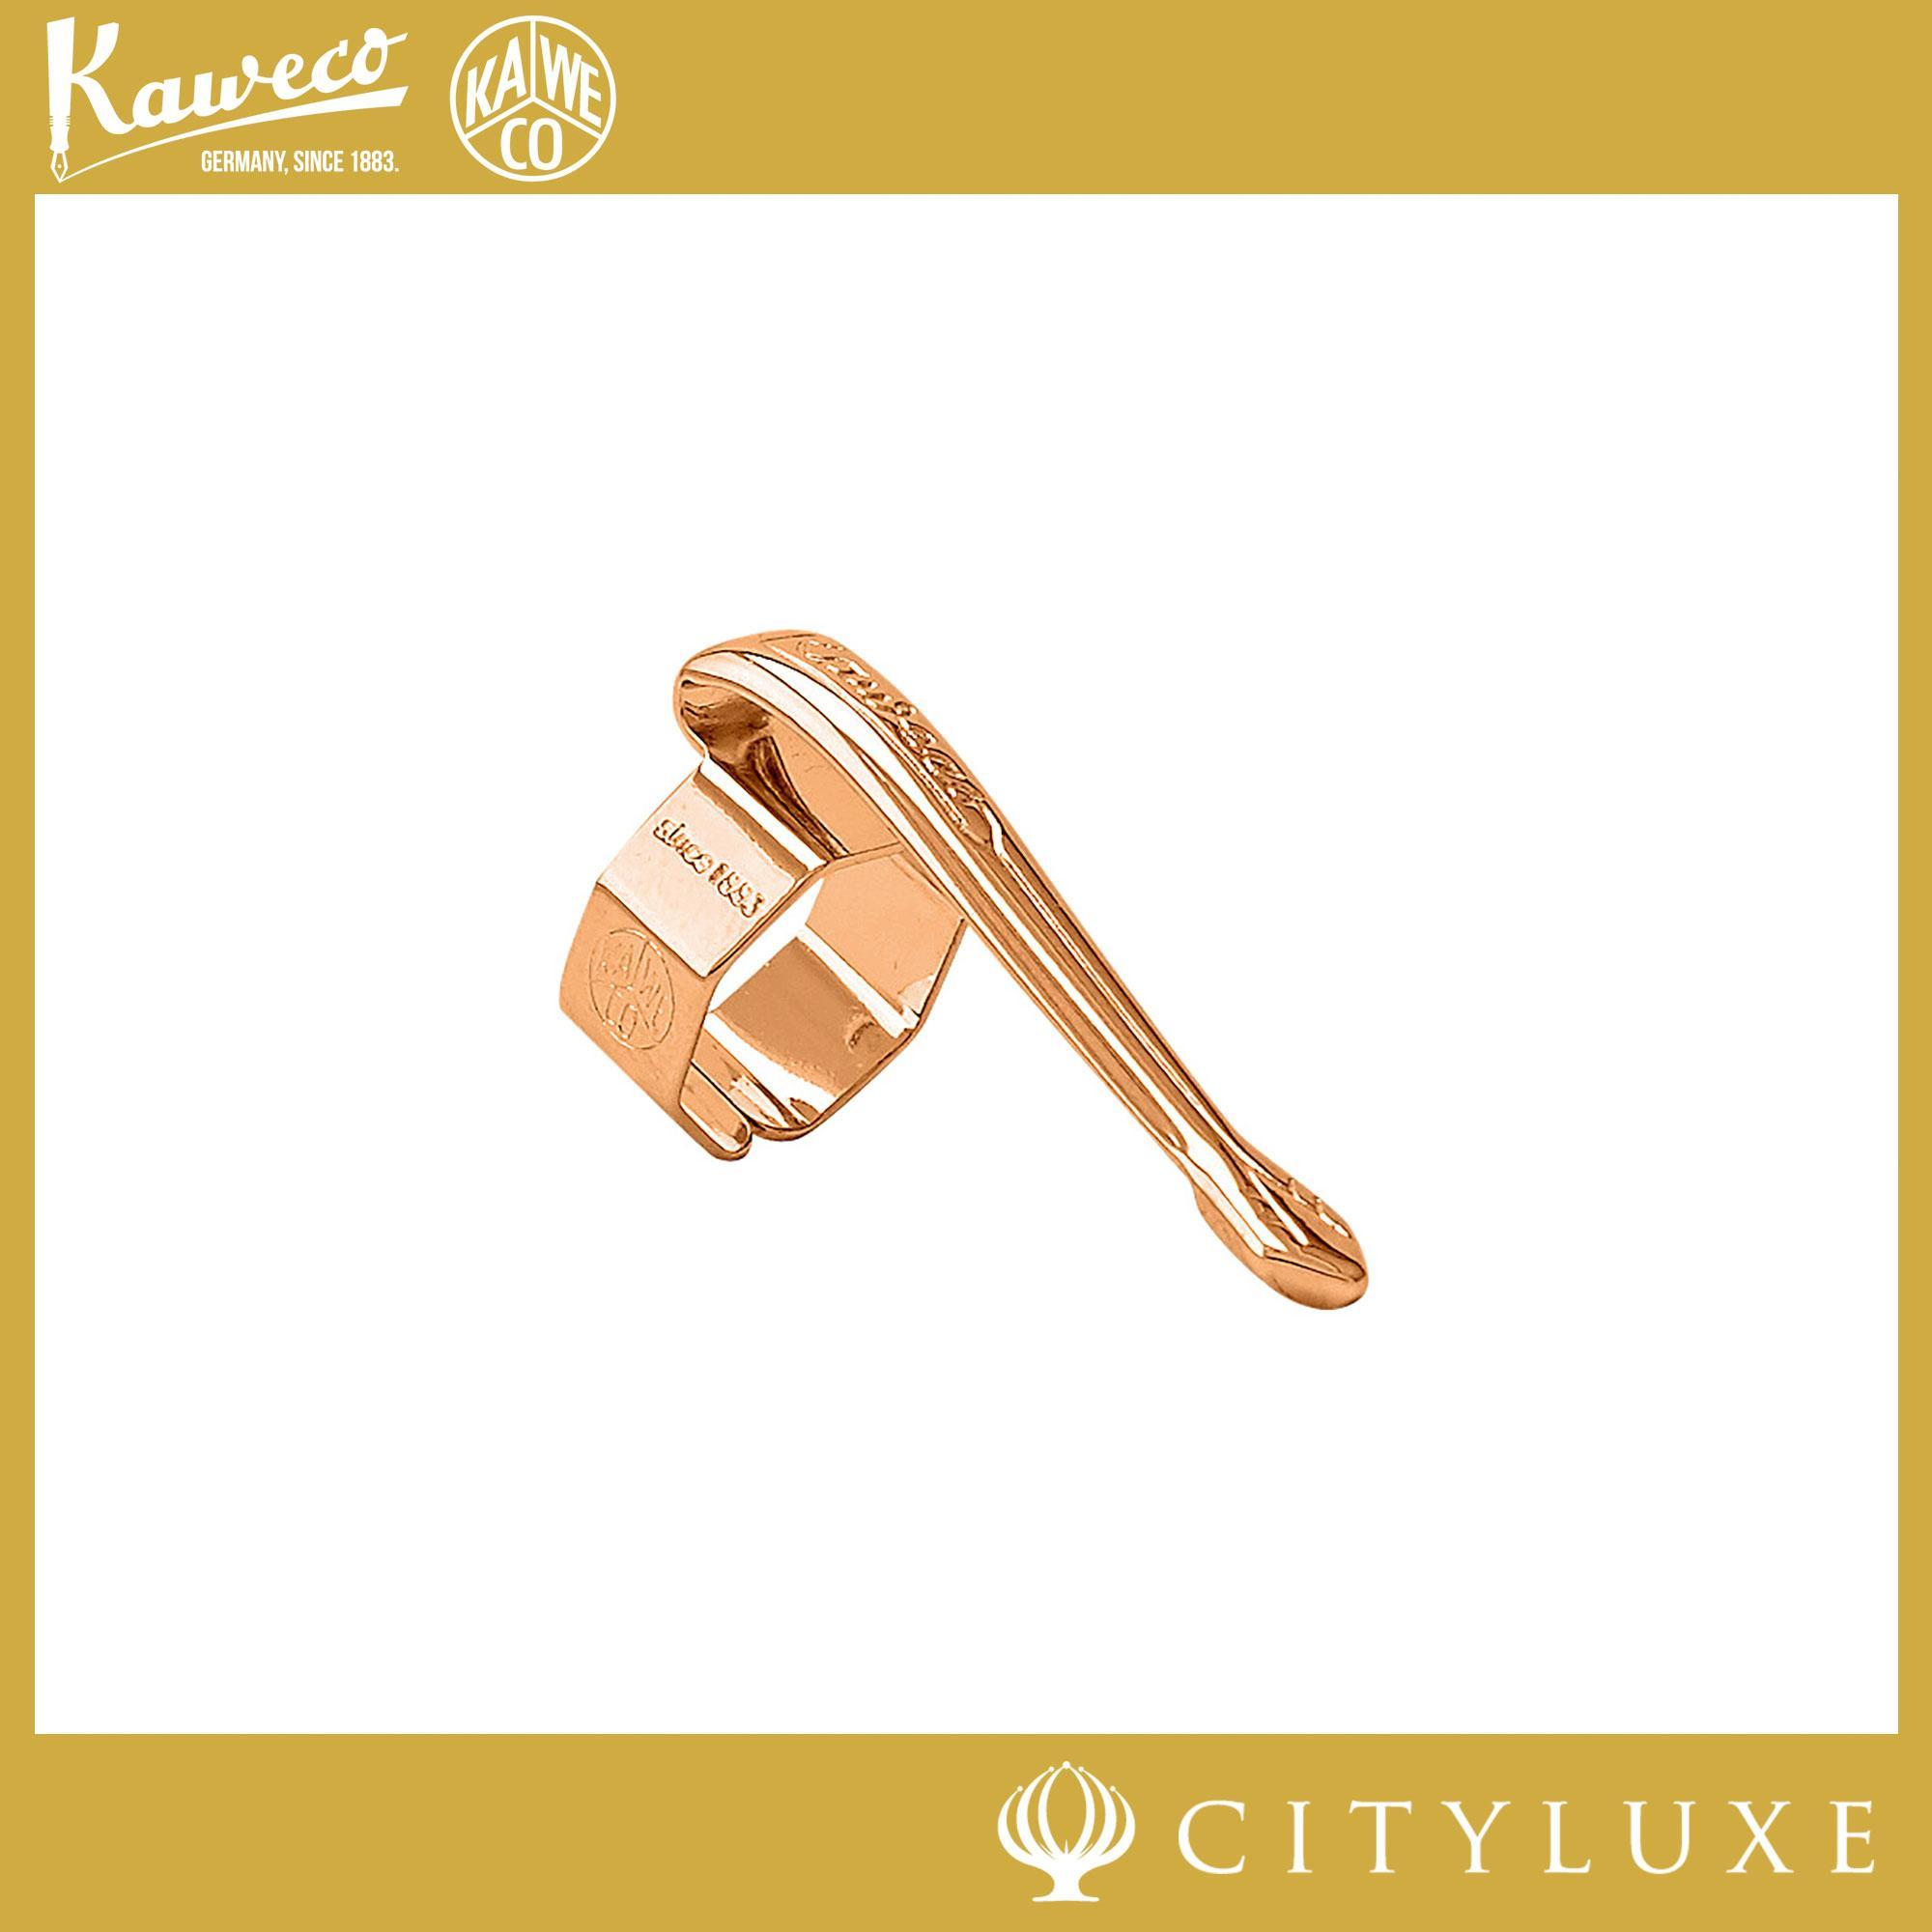 Kaweco Sport / Special Nostalgic Octagonal Pen Clip Chrome / Gold / Bronze / Black - For Kaweco Sport Series Classic Retro Pen Accessories.